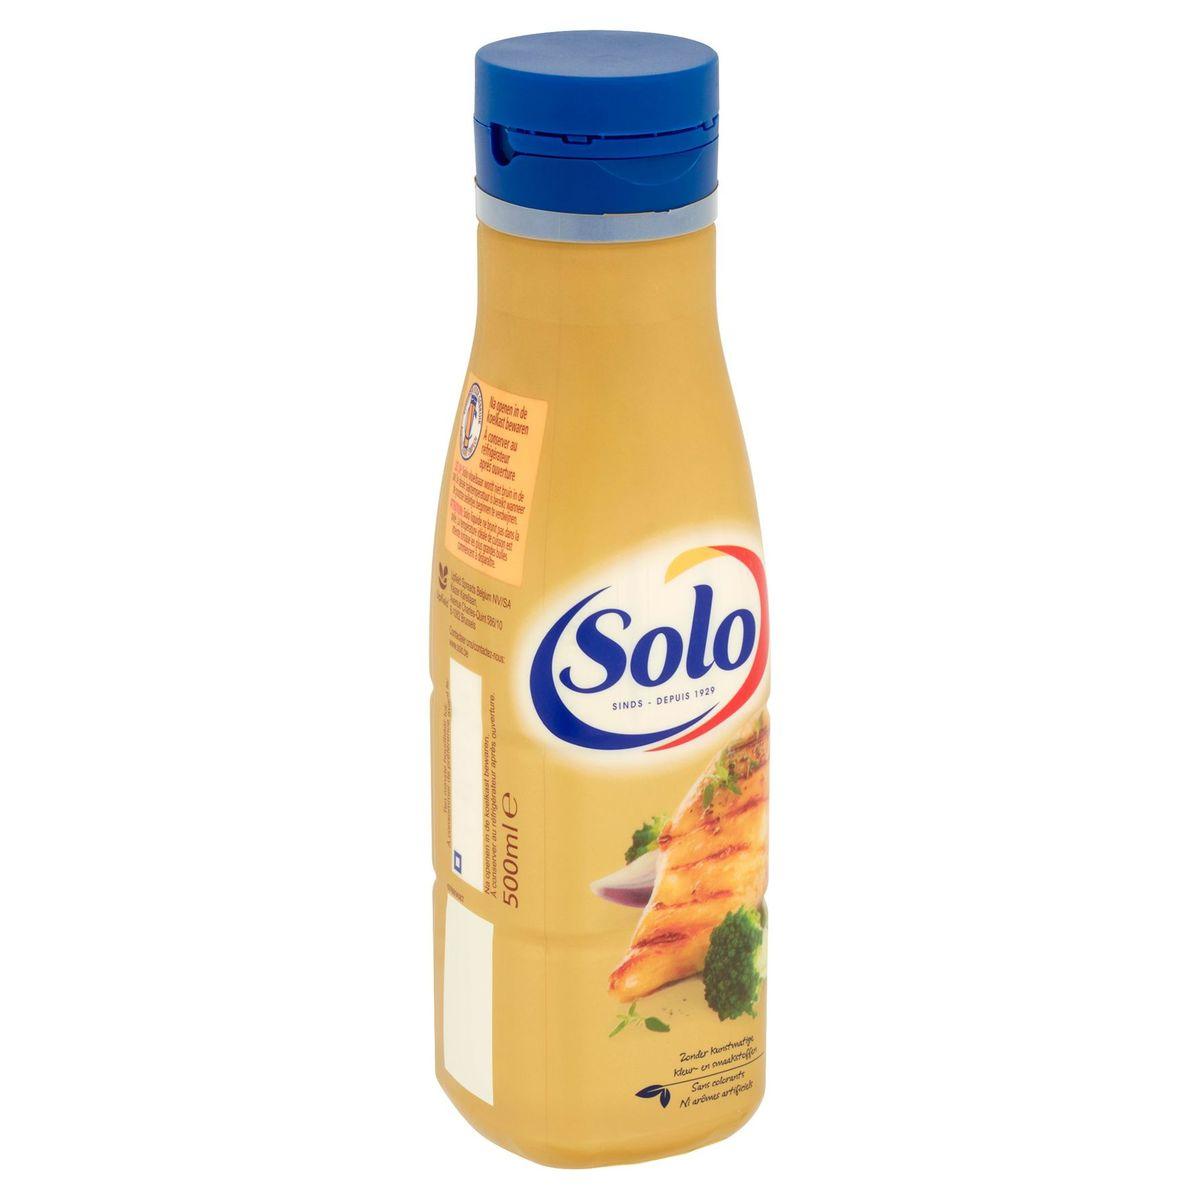 Solo   Cuire et rôtir   500ml